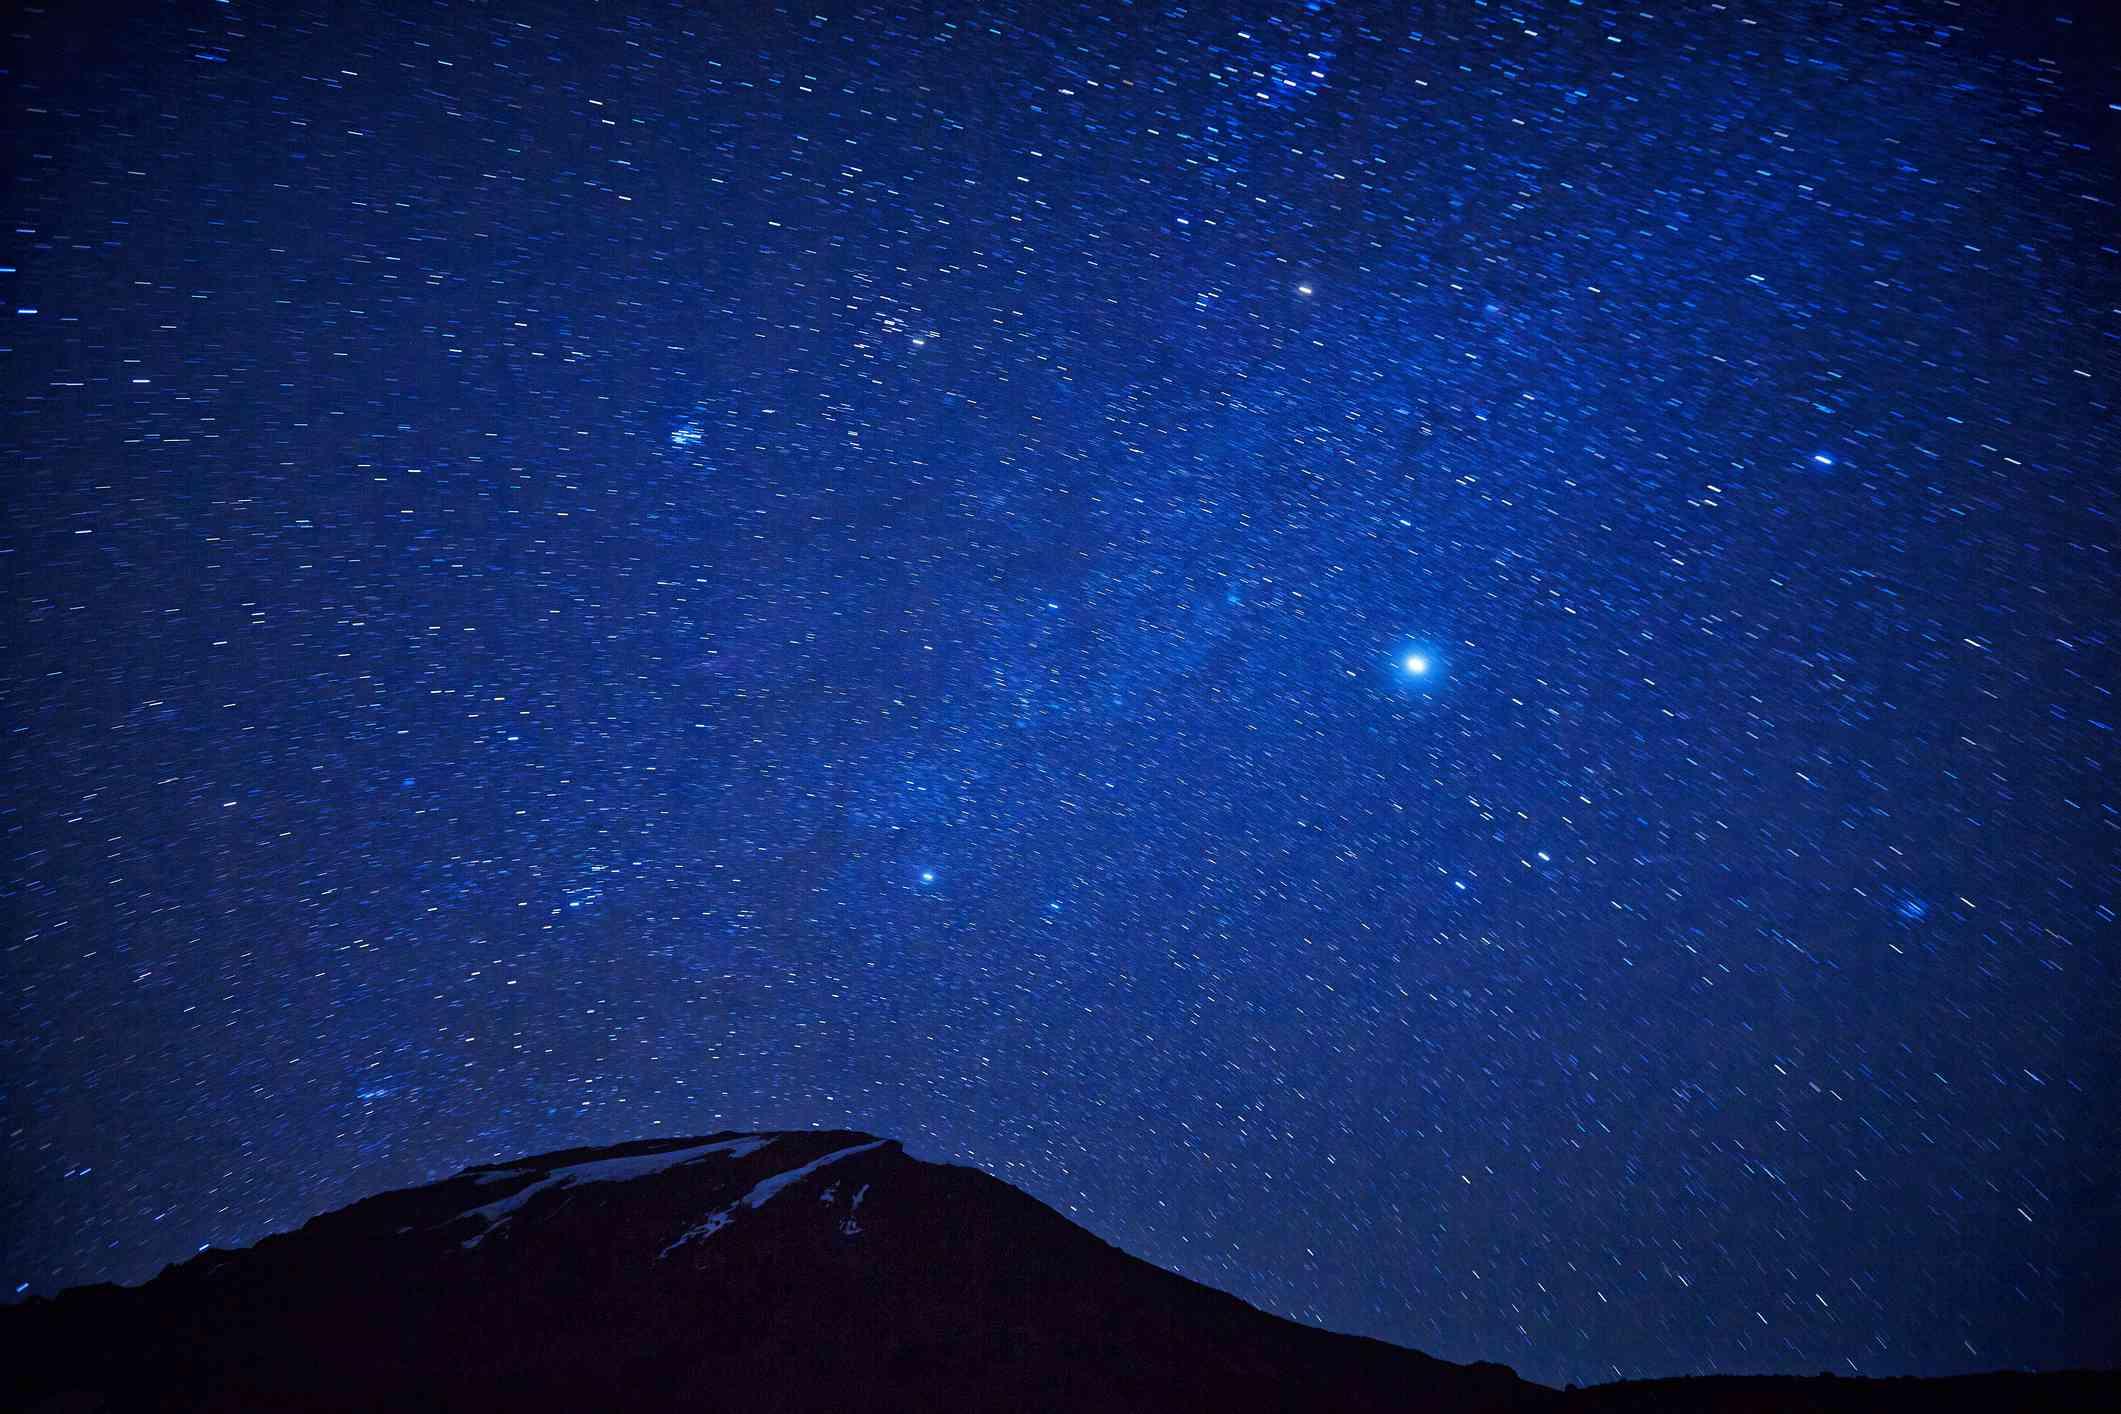 Mt Kilimanjaro, Karanga valley summit at night with stars.